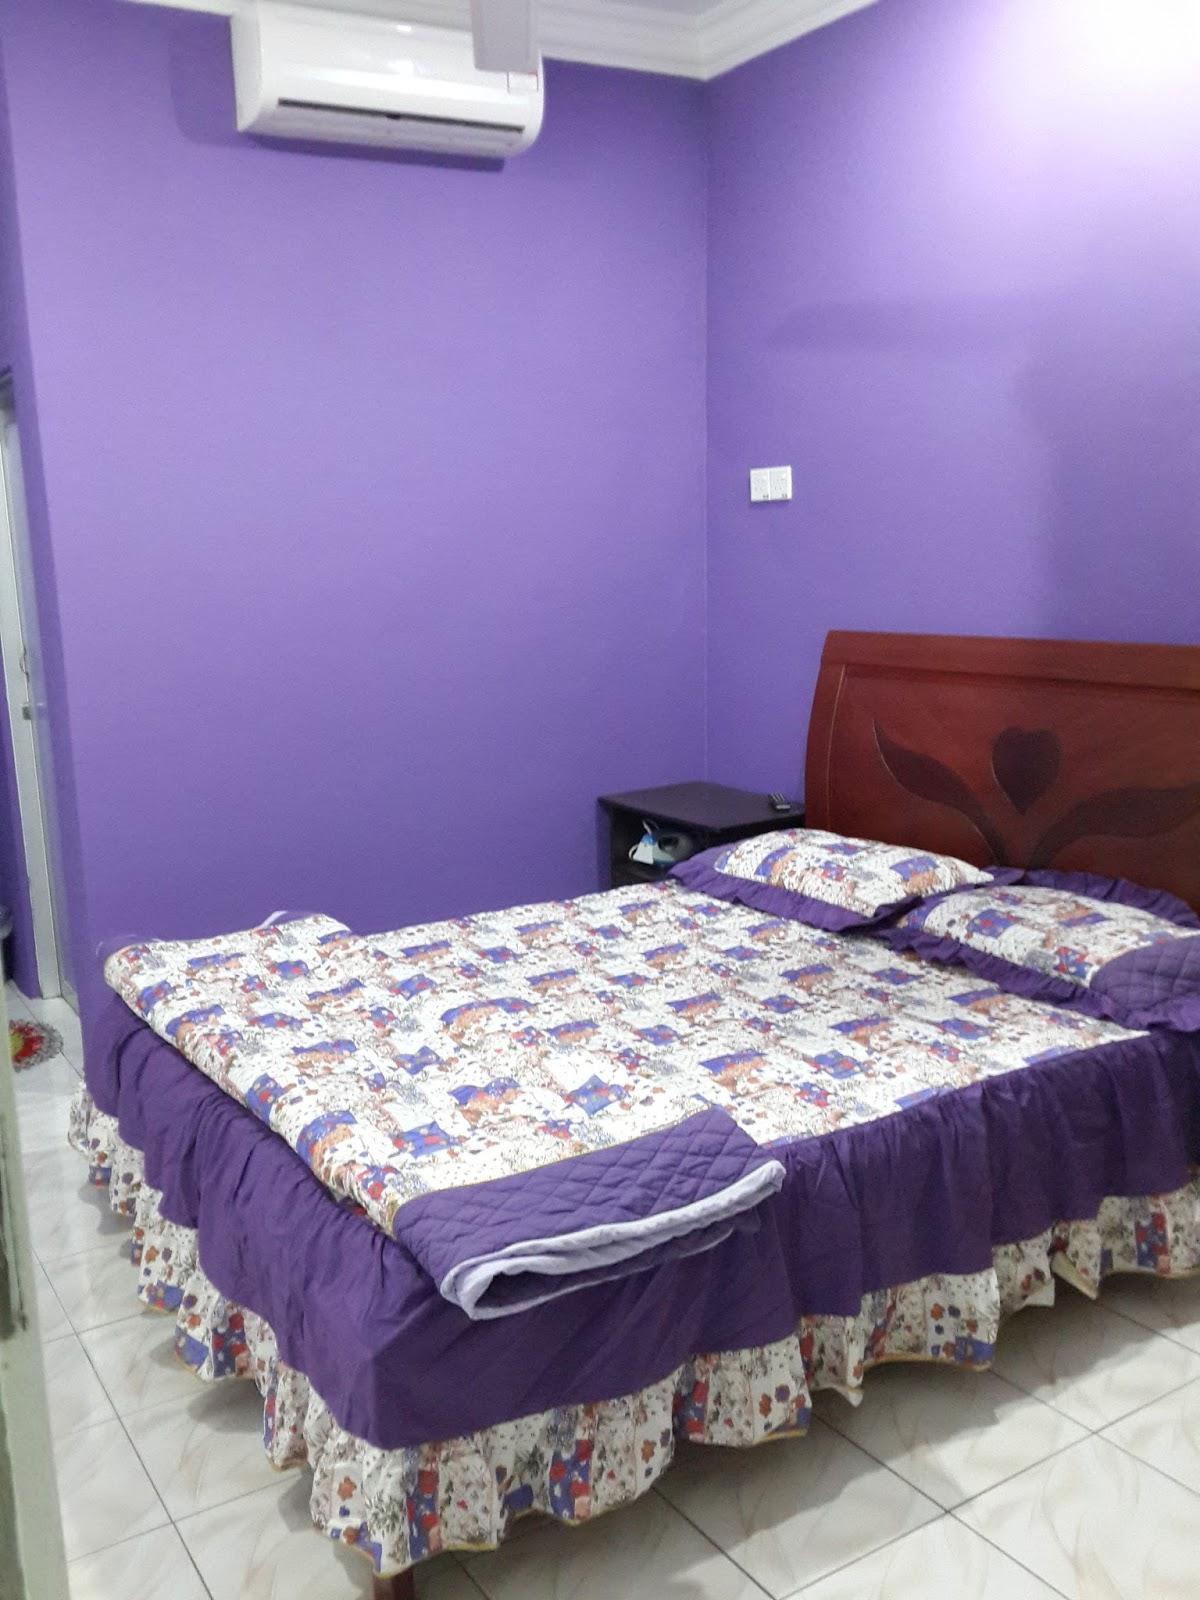 Bilik Tidur 1 Dilengkapi Dengan 2 Katil Single Kipas Air Conditioner Tuala Tandas Water Heater